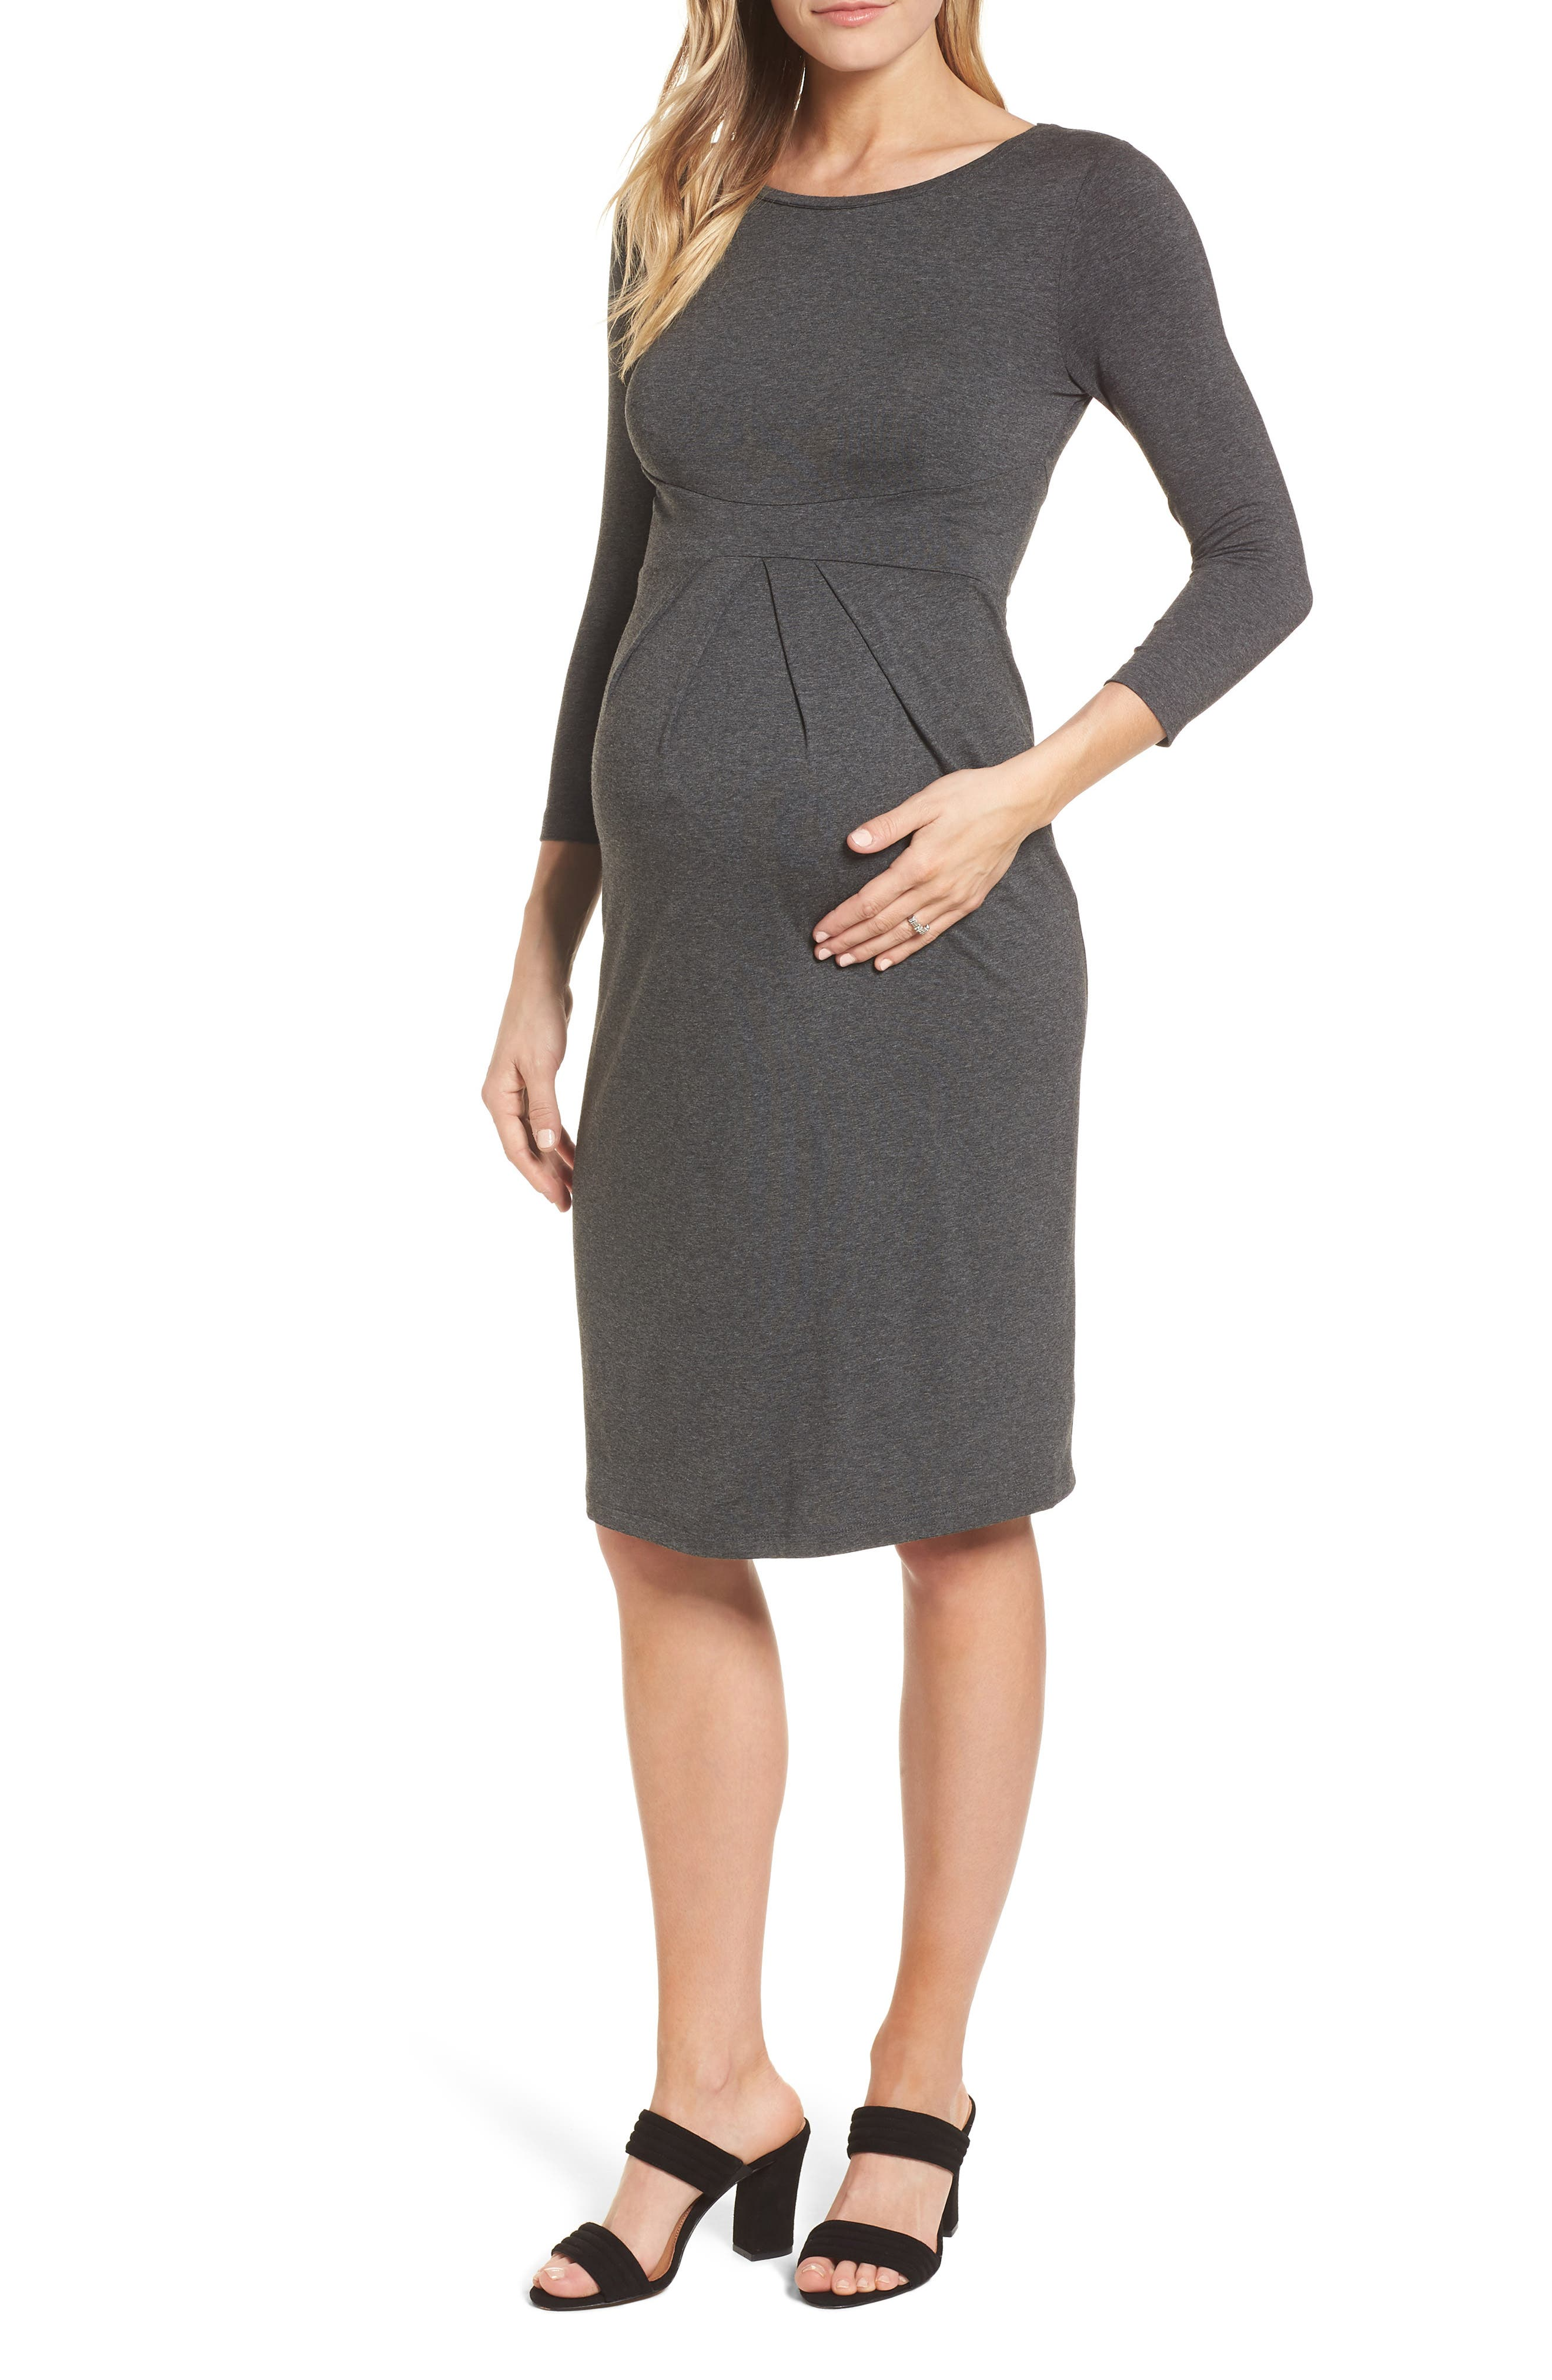 Ivybridge Jersey Maternity Dress,                             Main thumbnail 1, color,                             Dark Grey Marl